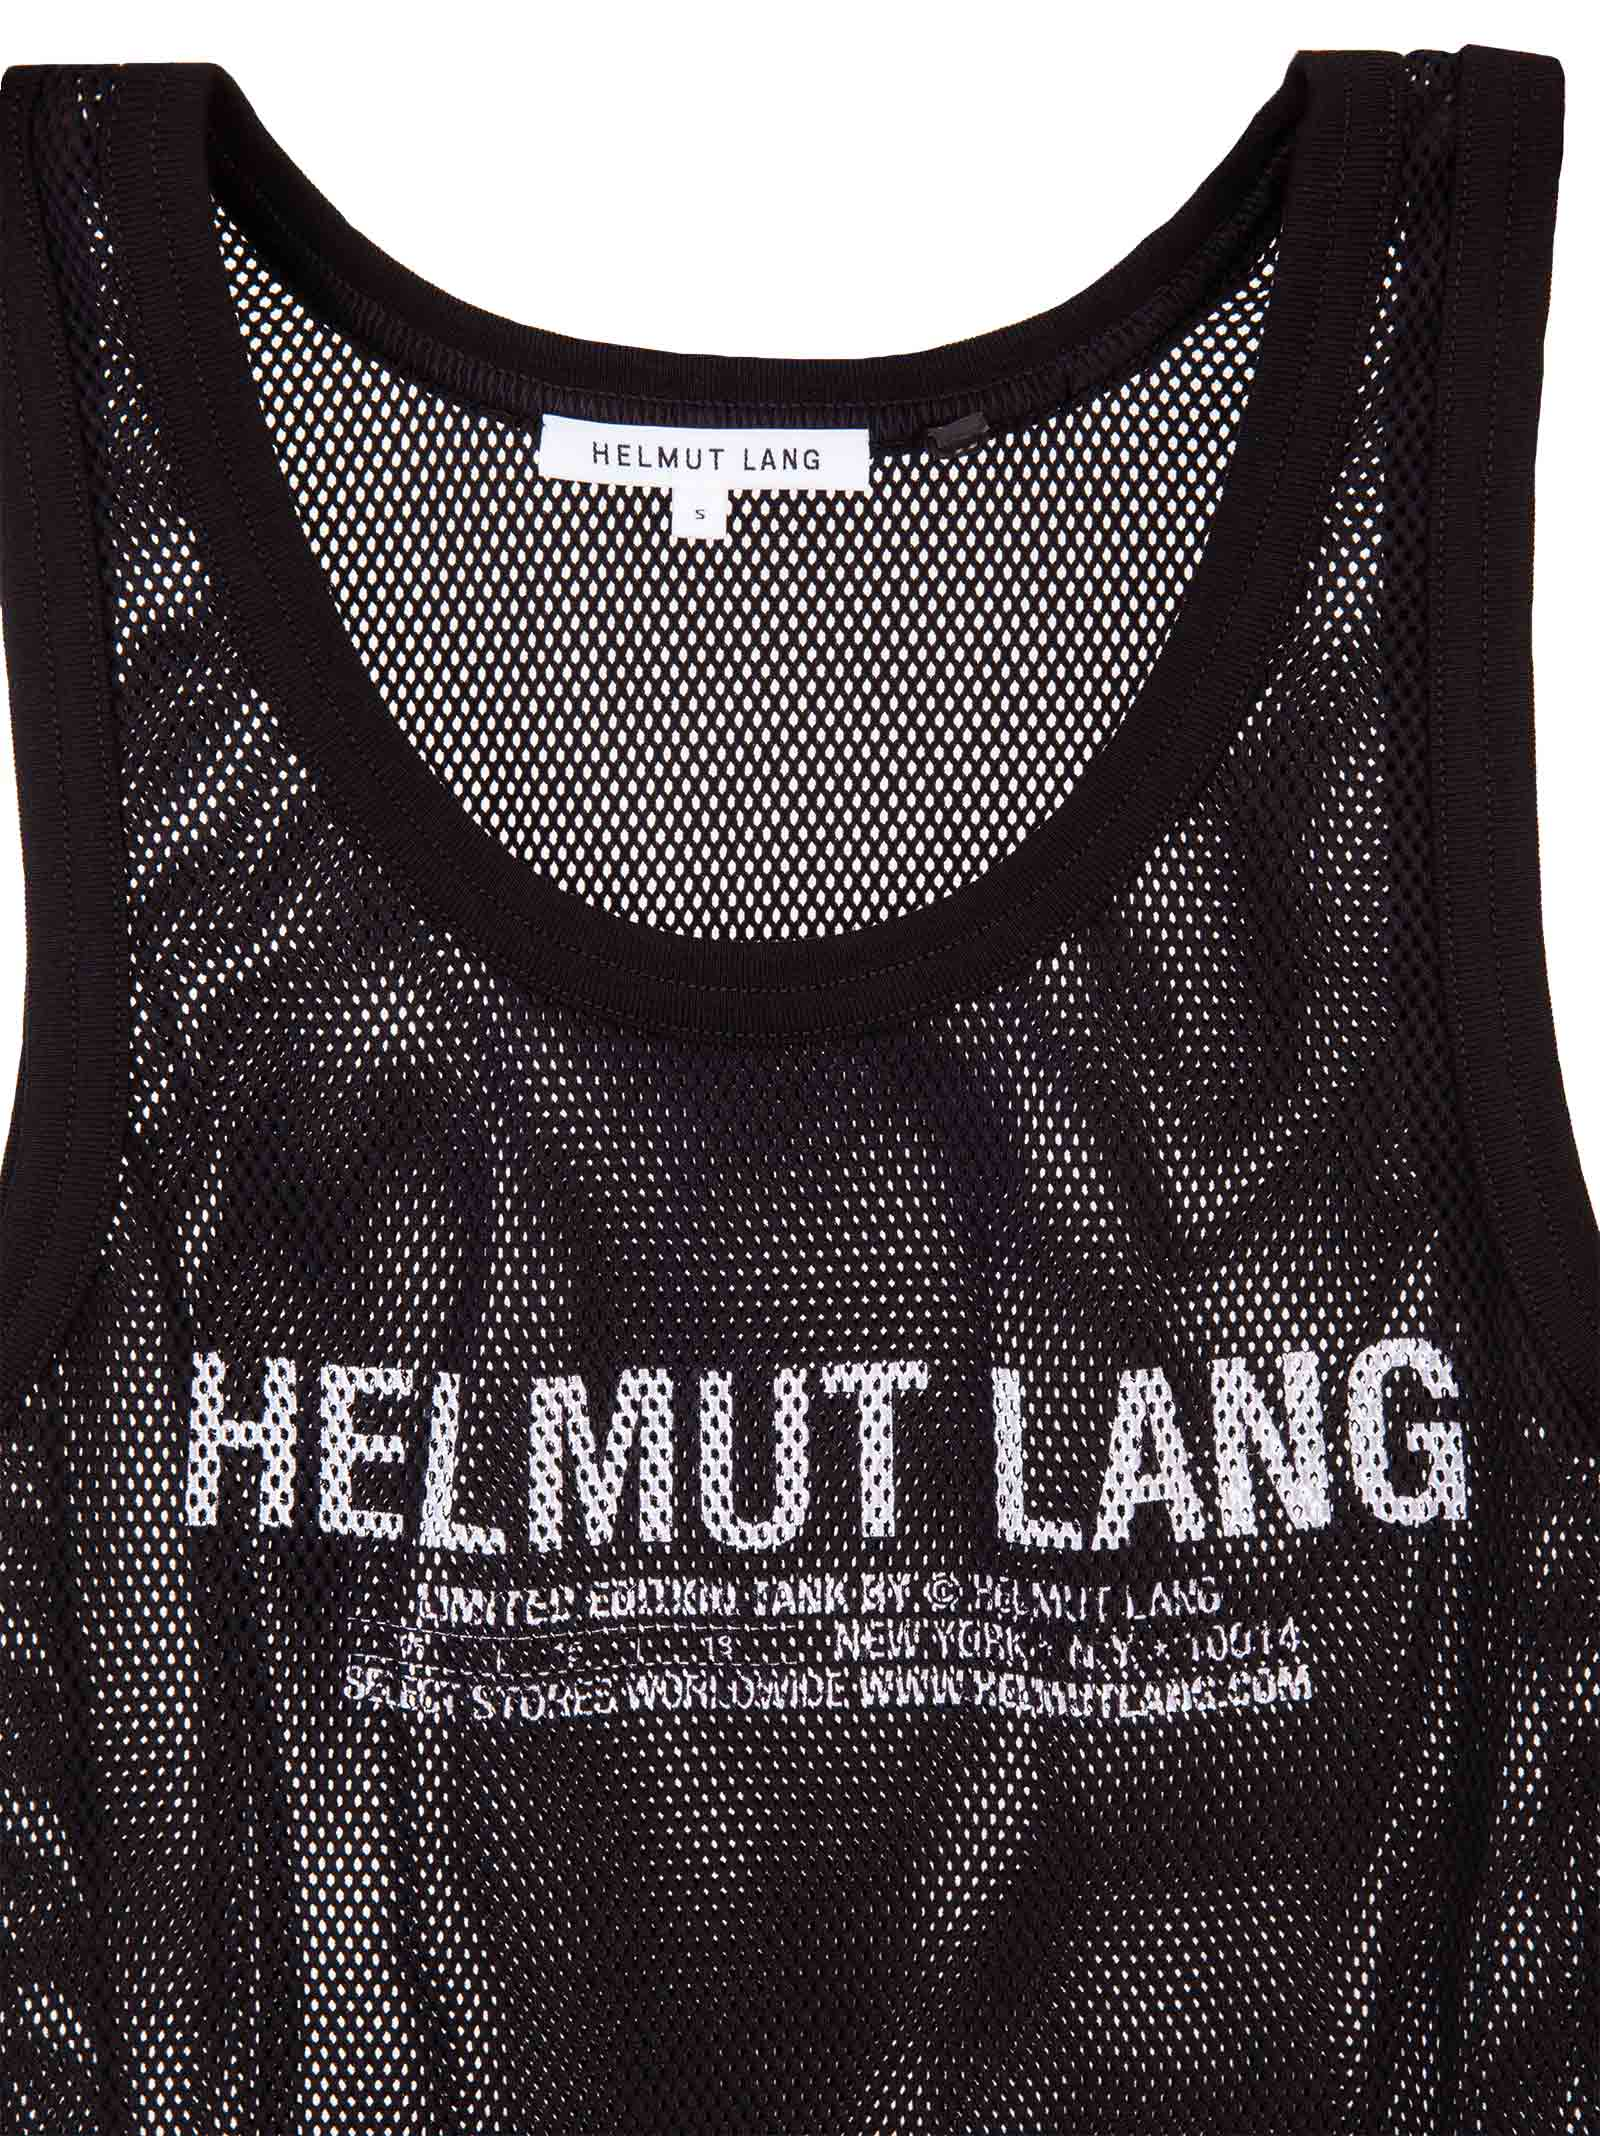 e3999604e8db18 Helmut Lang tanktop - Helmut Lang - Michele Franzese Moda